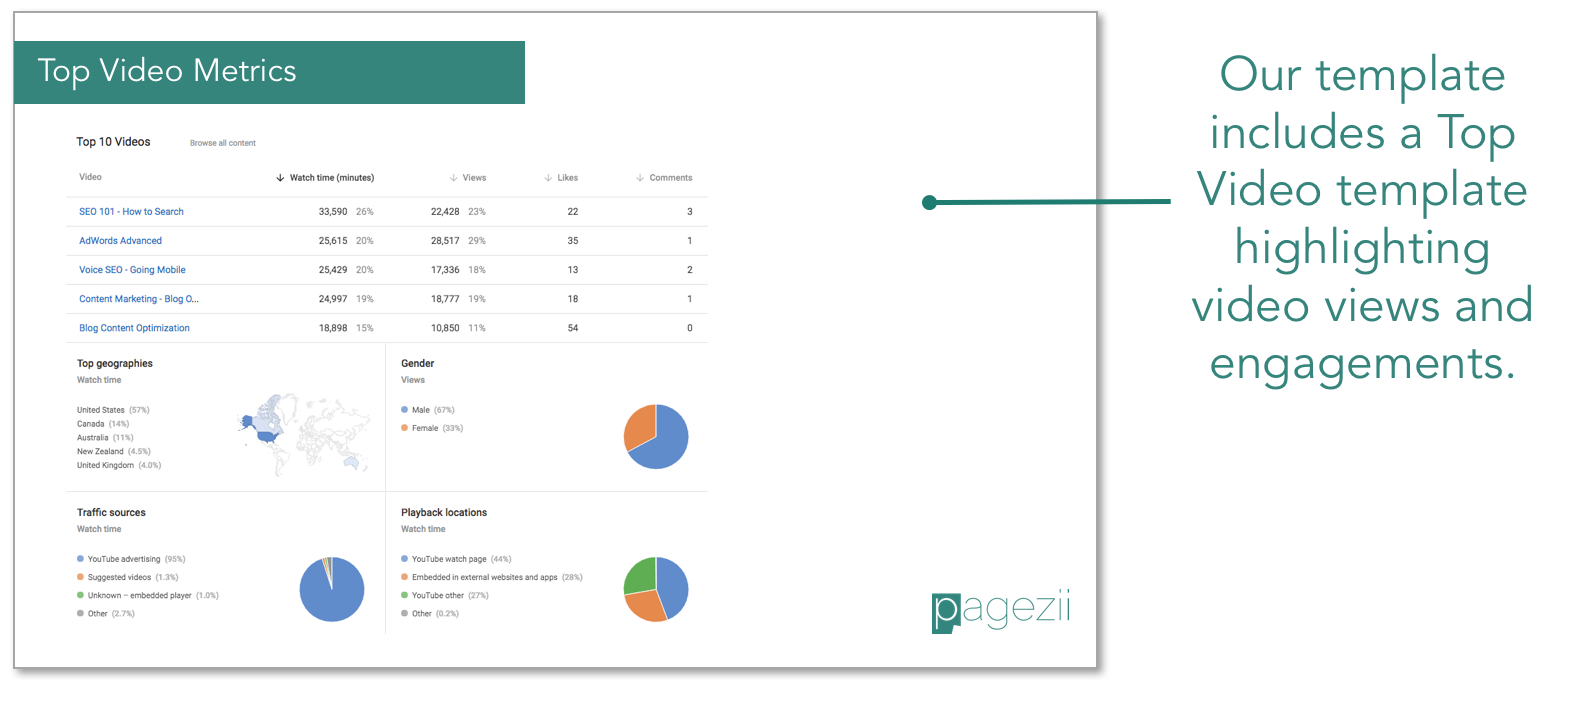 YouTube-Analytics-Video Report-Template-Top-video-metrics-highlight